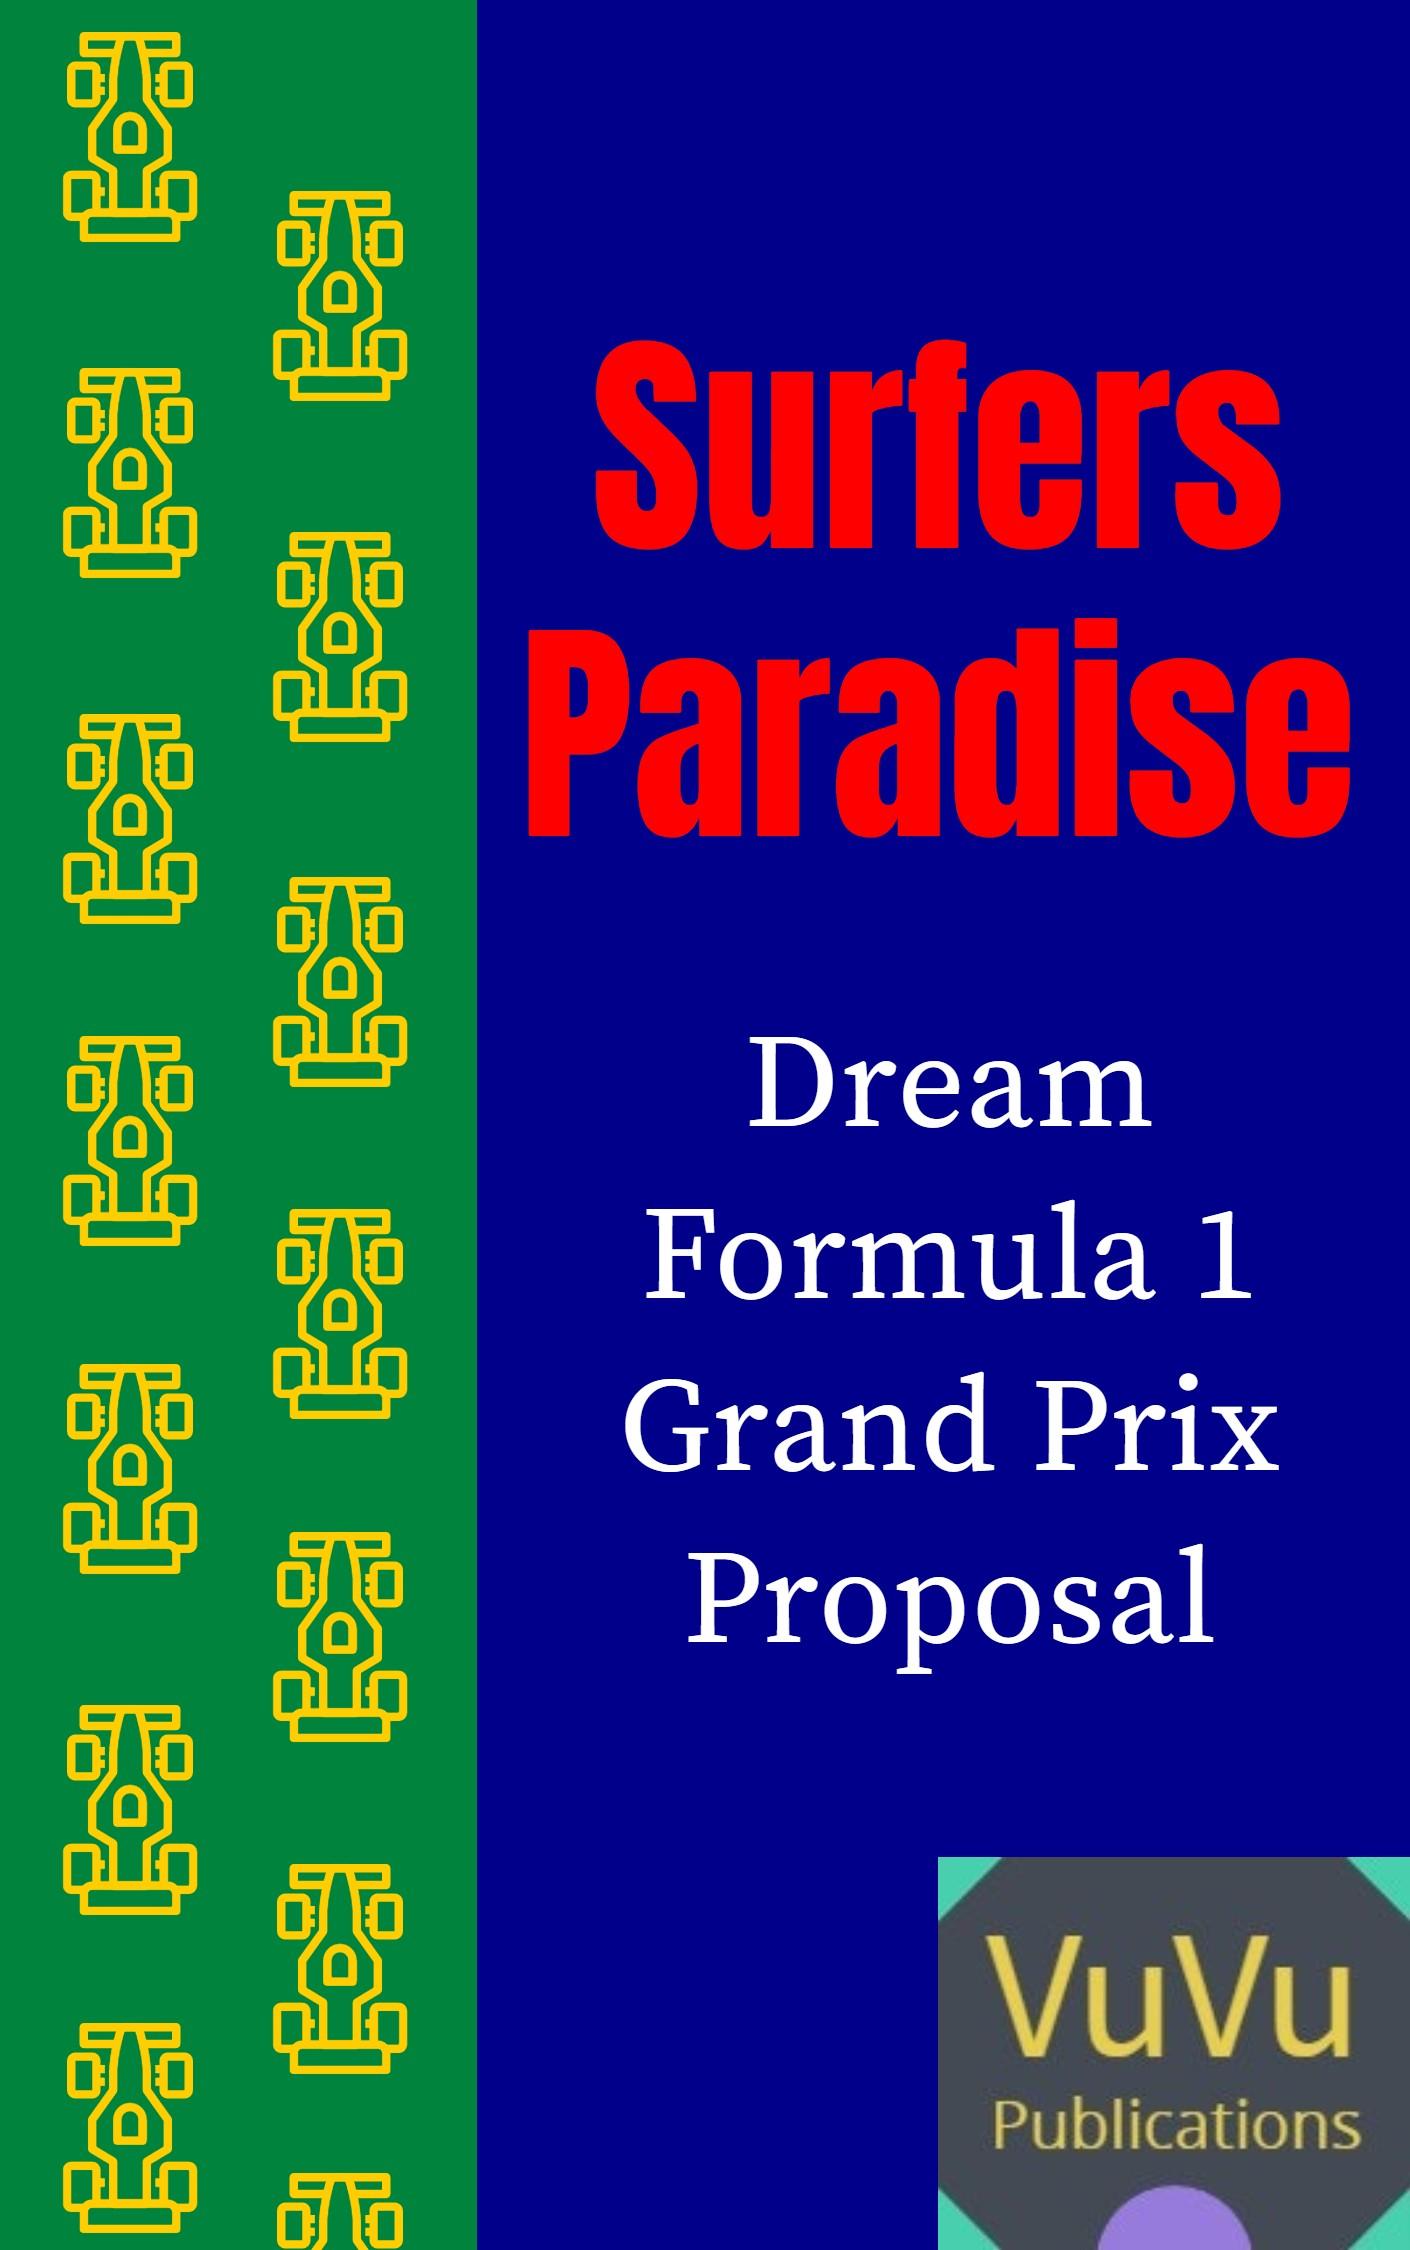 Surfers-Paradise-GP